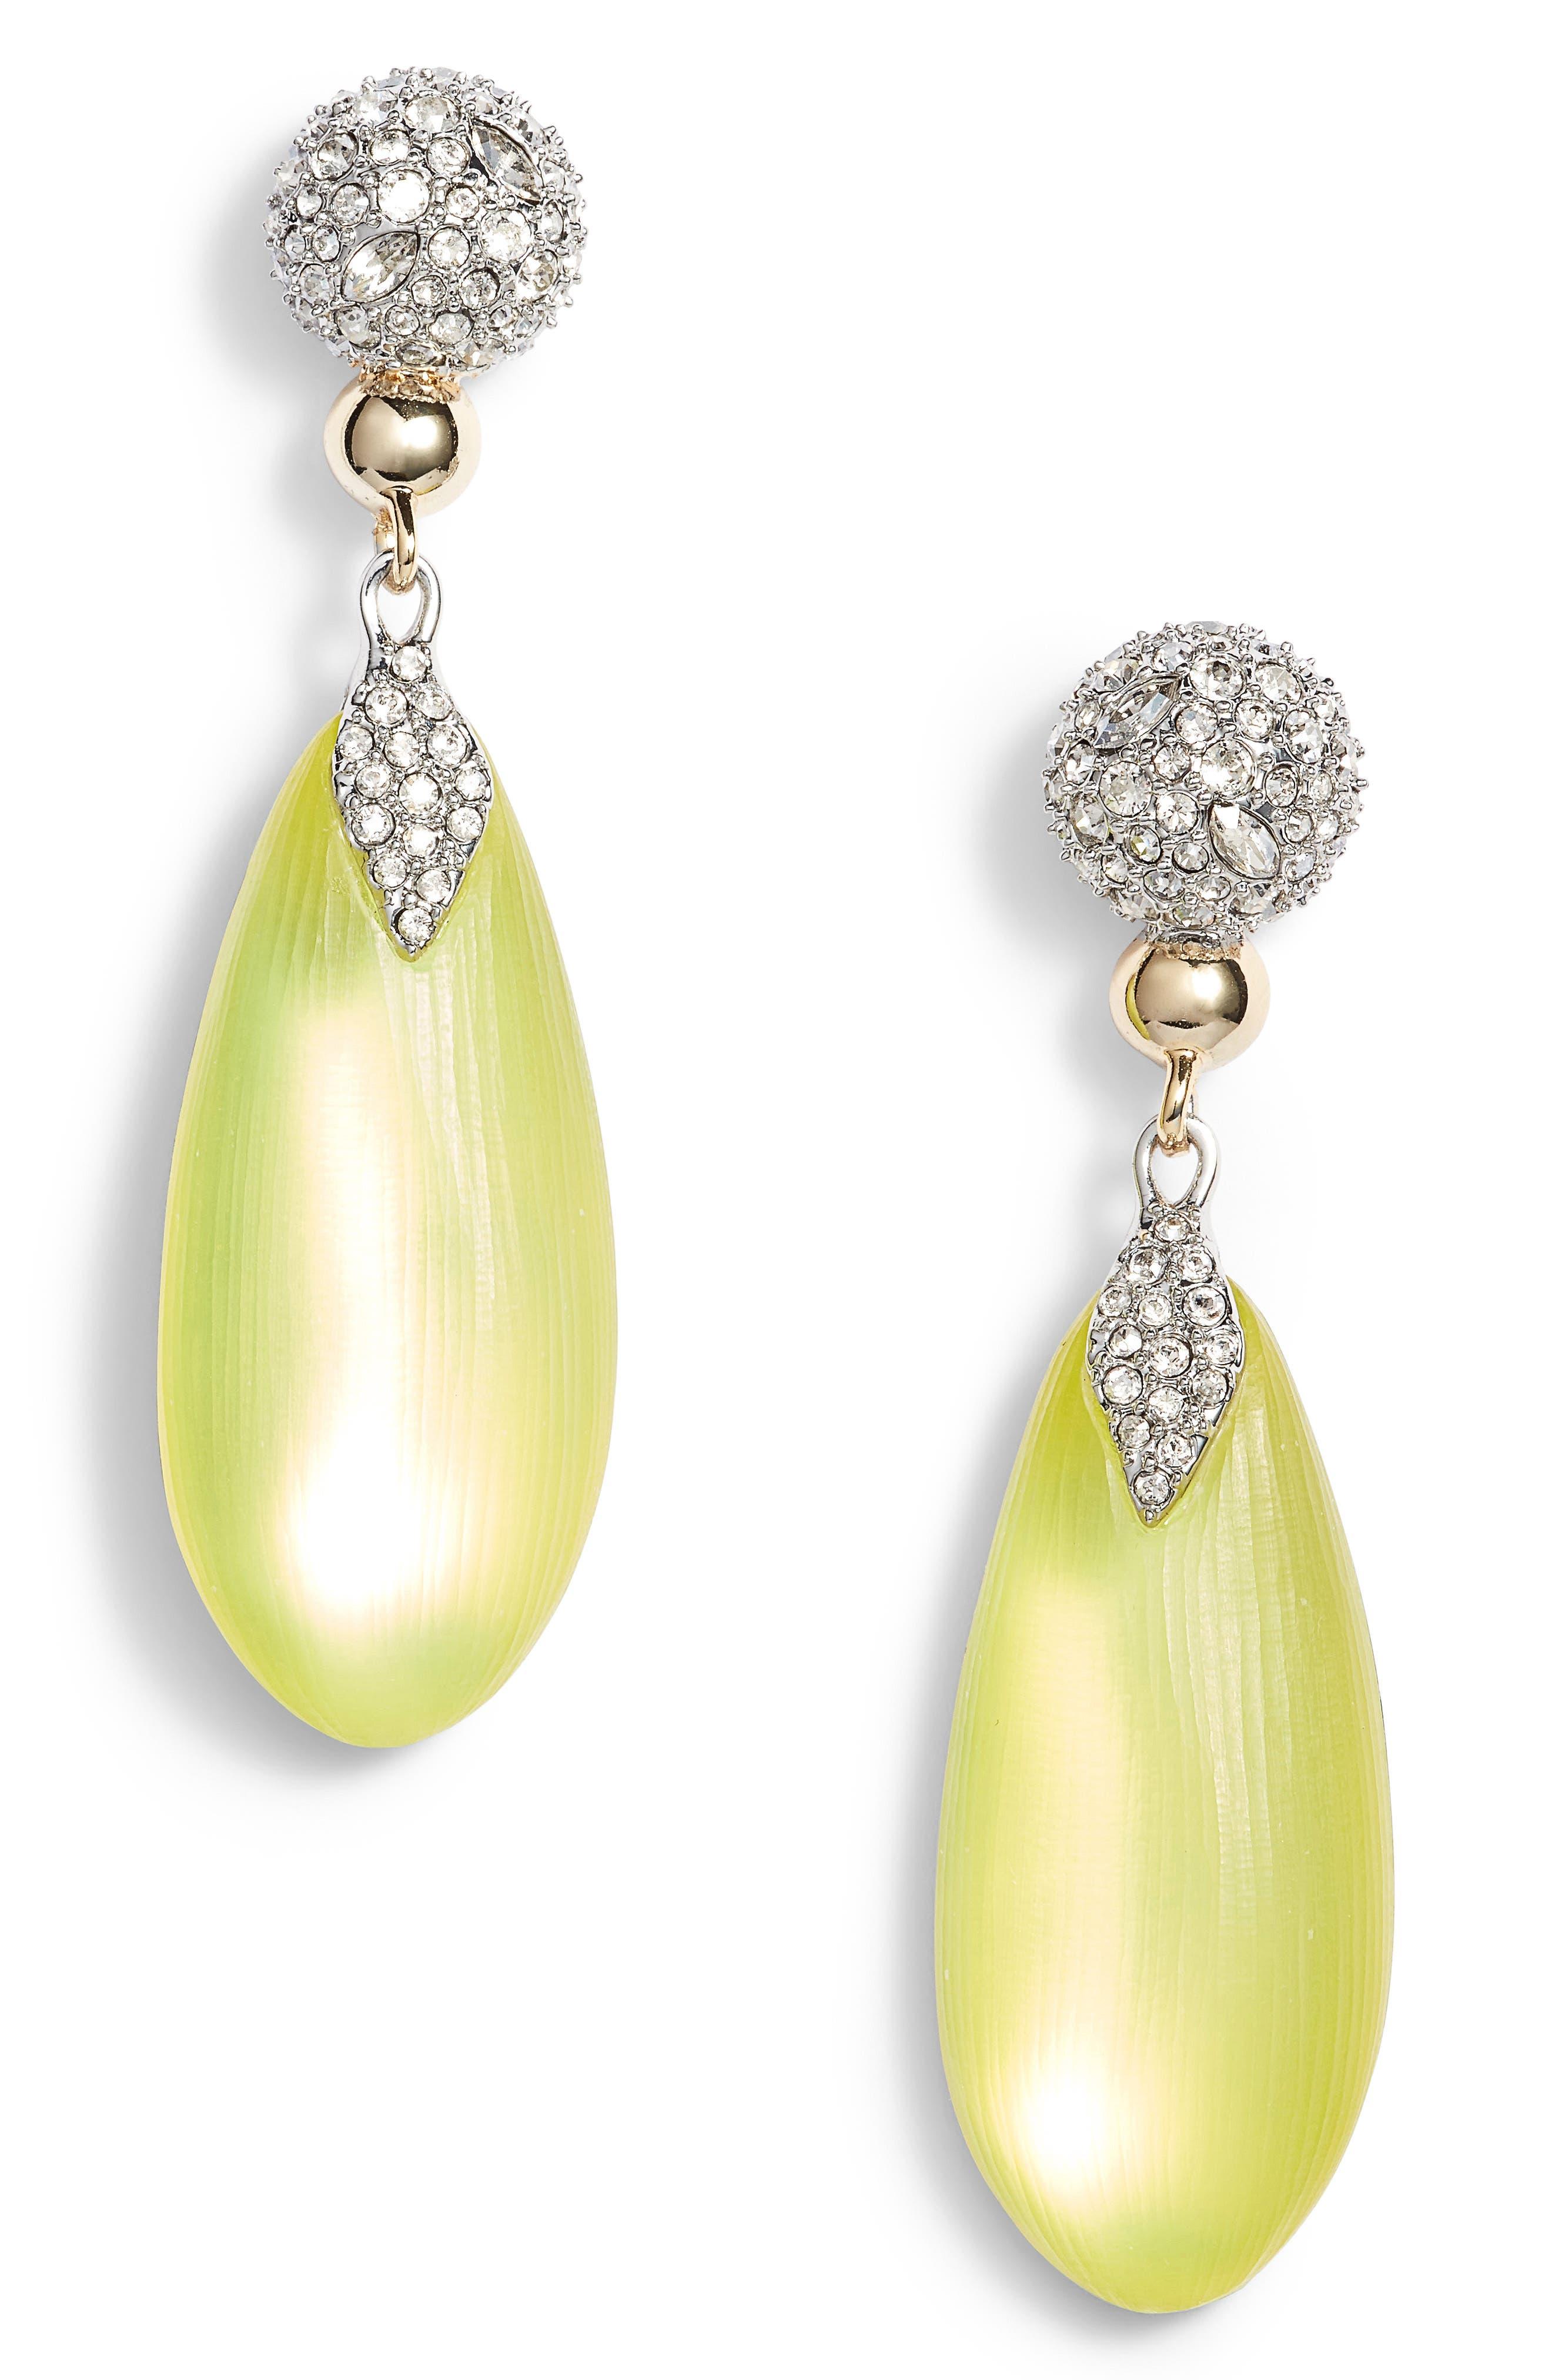 Main Image - Alexis Bittar Crystal Encrusted Lucite® Drop Earrings